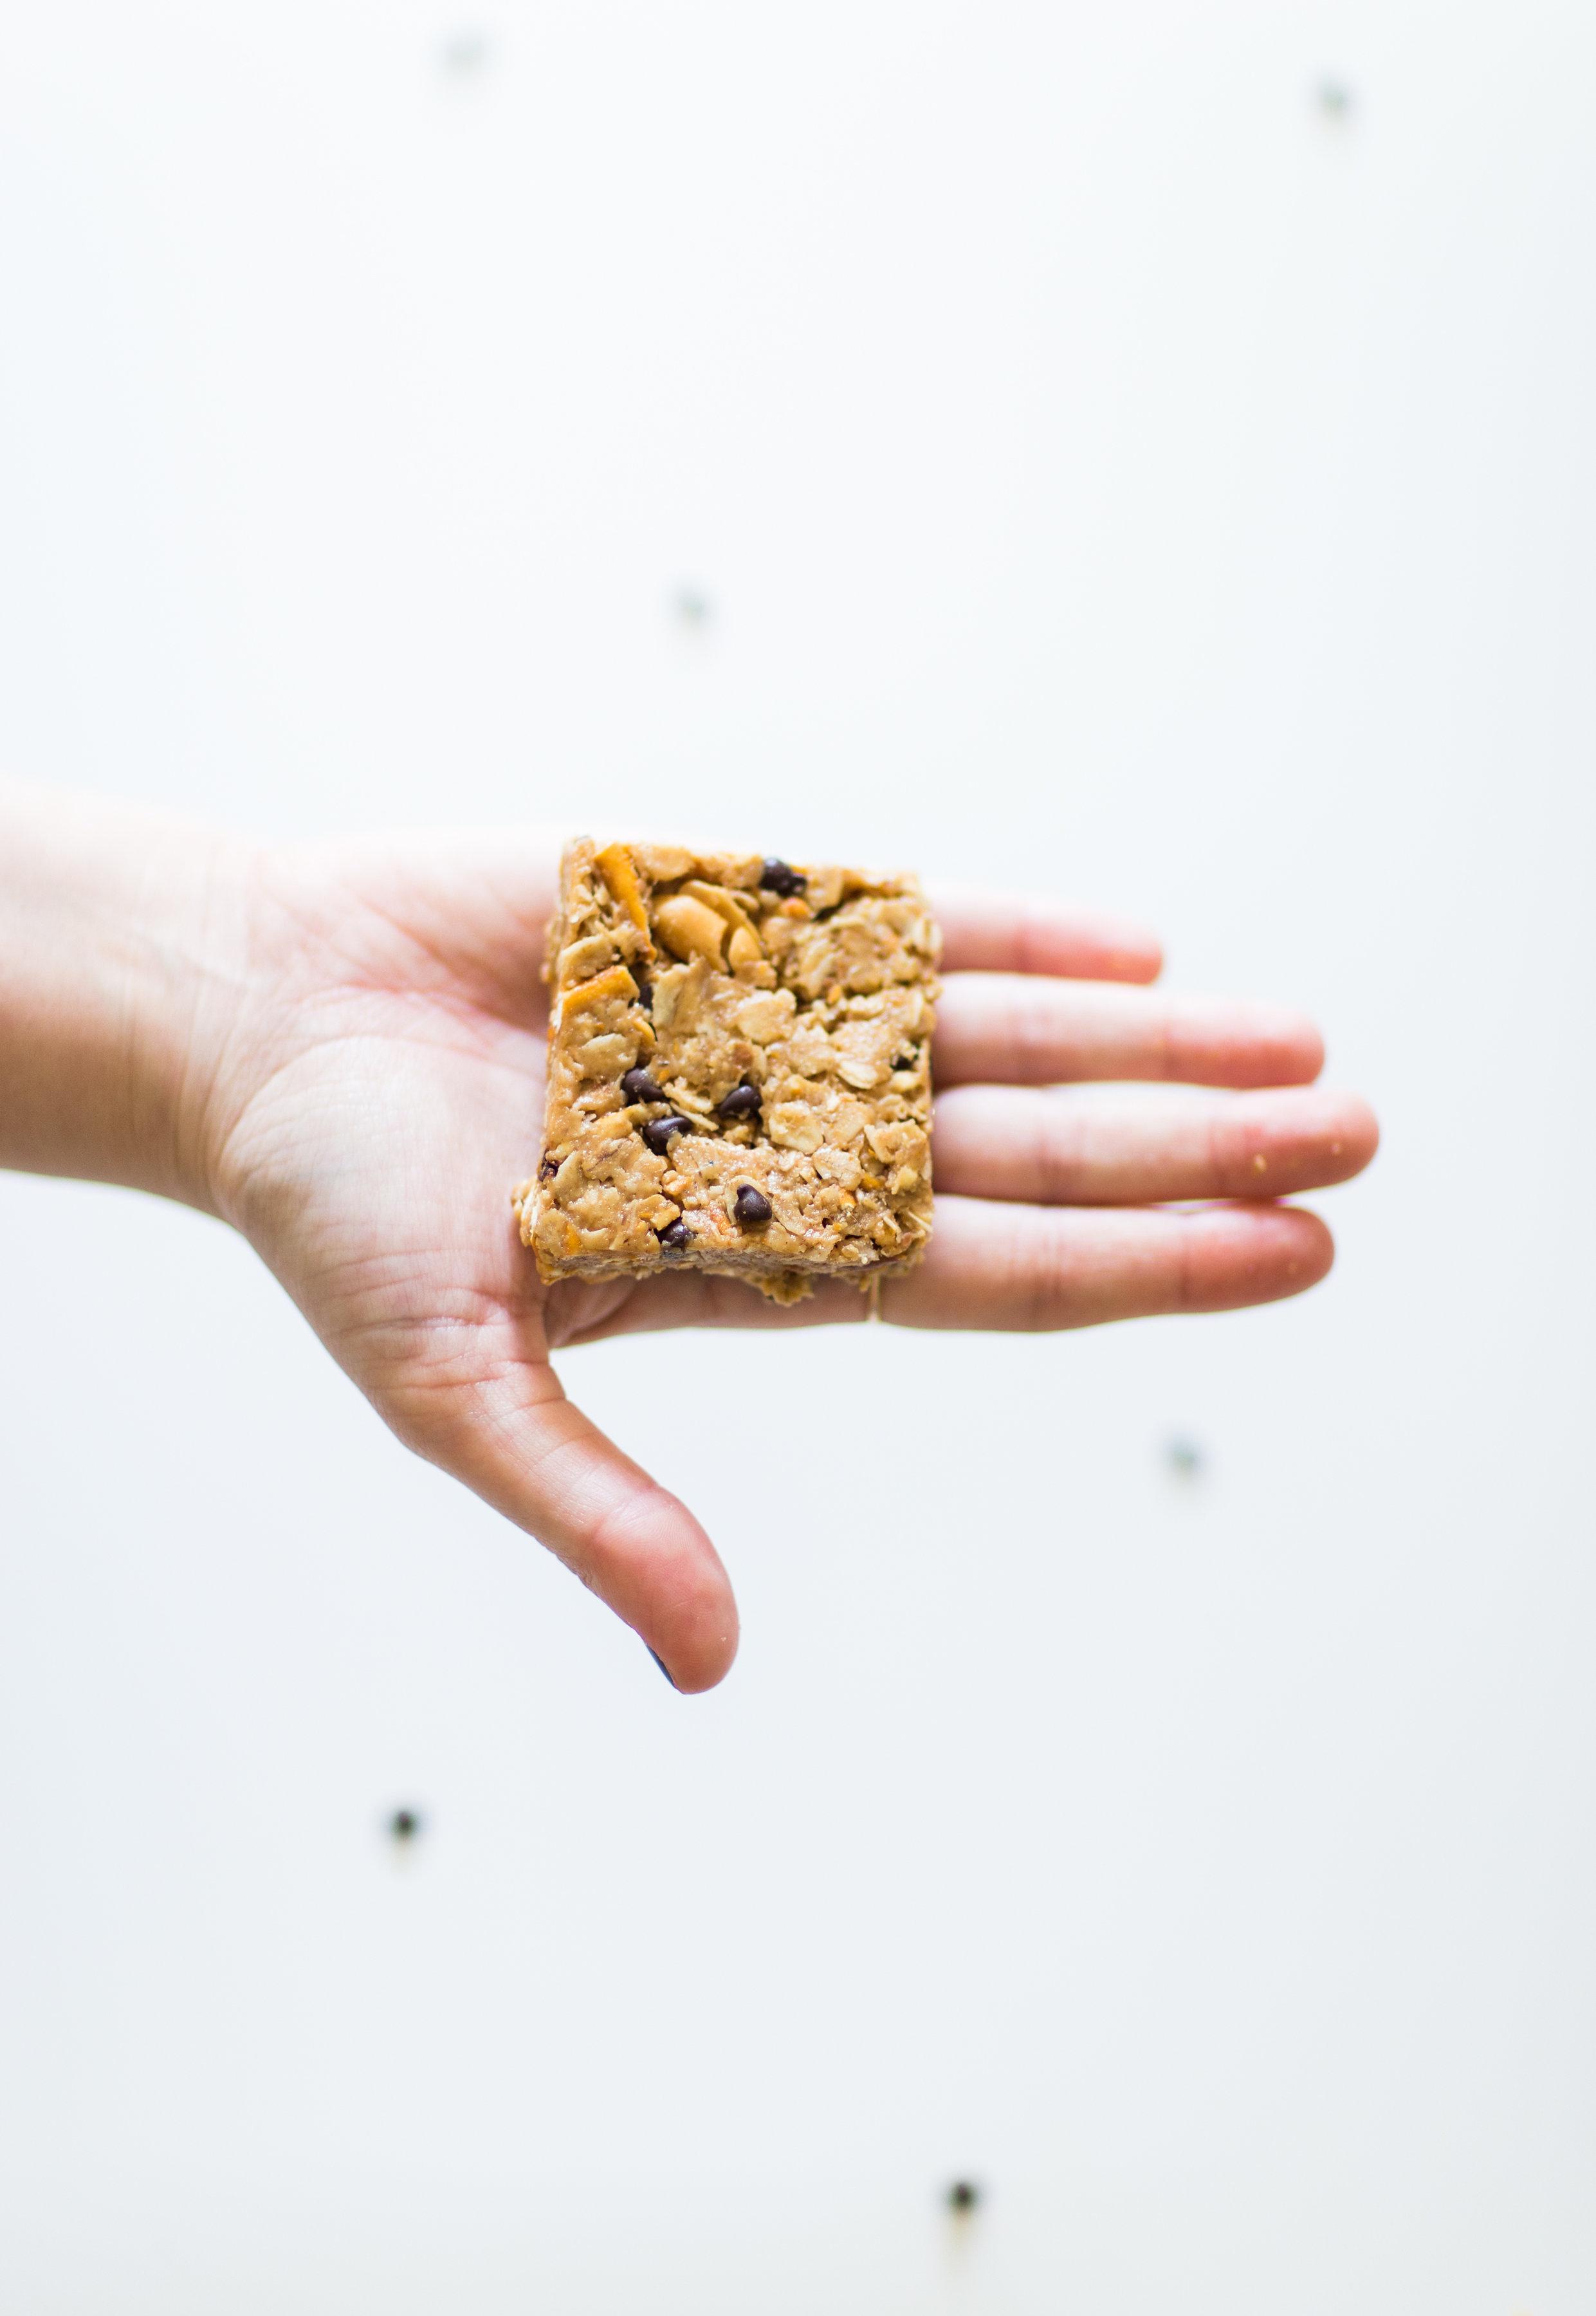 How to make our favorite dairy-free soft chocolate chip pretzel granola bars. Click through for the easy recipe. | glitterinc.com | @glitterinc